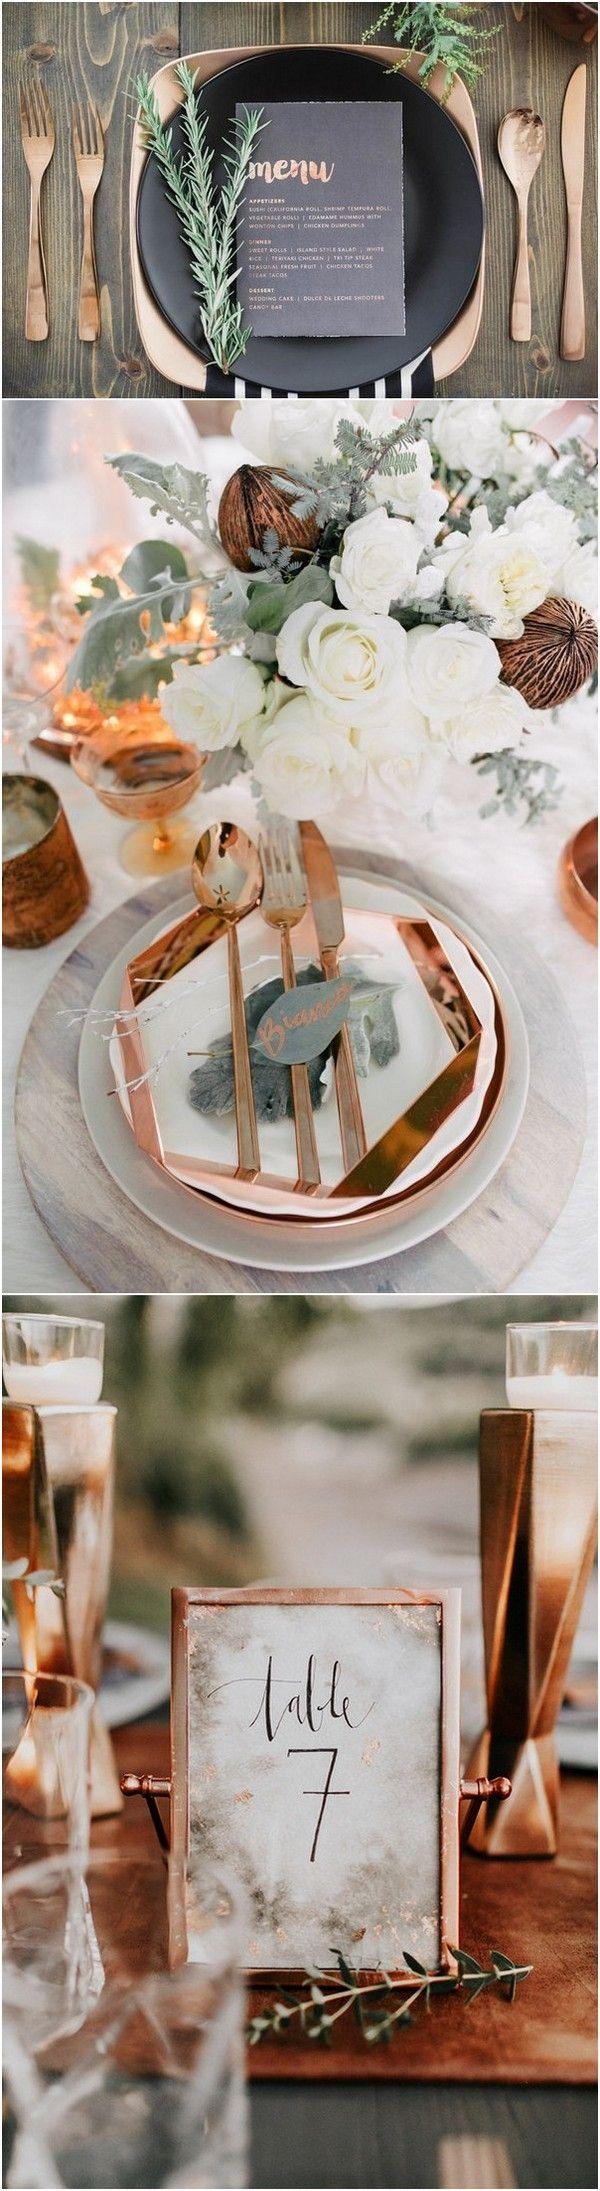 metallic copper wedding table setting ideas